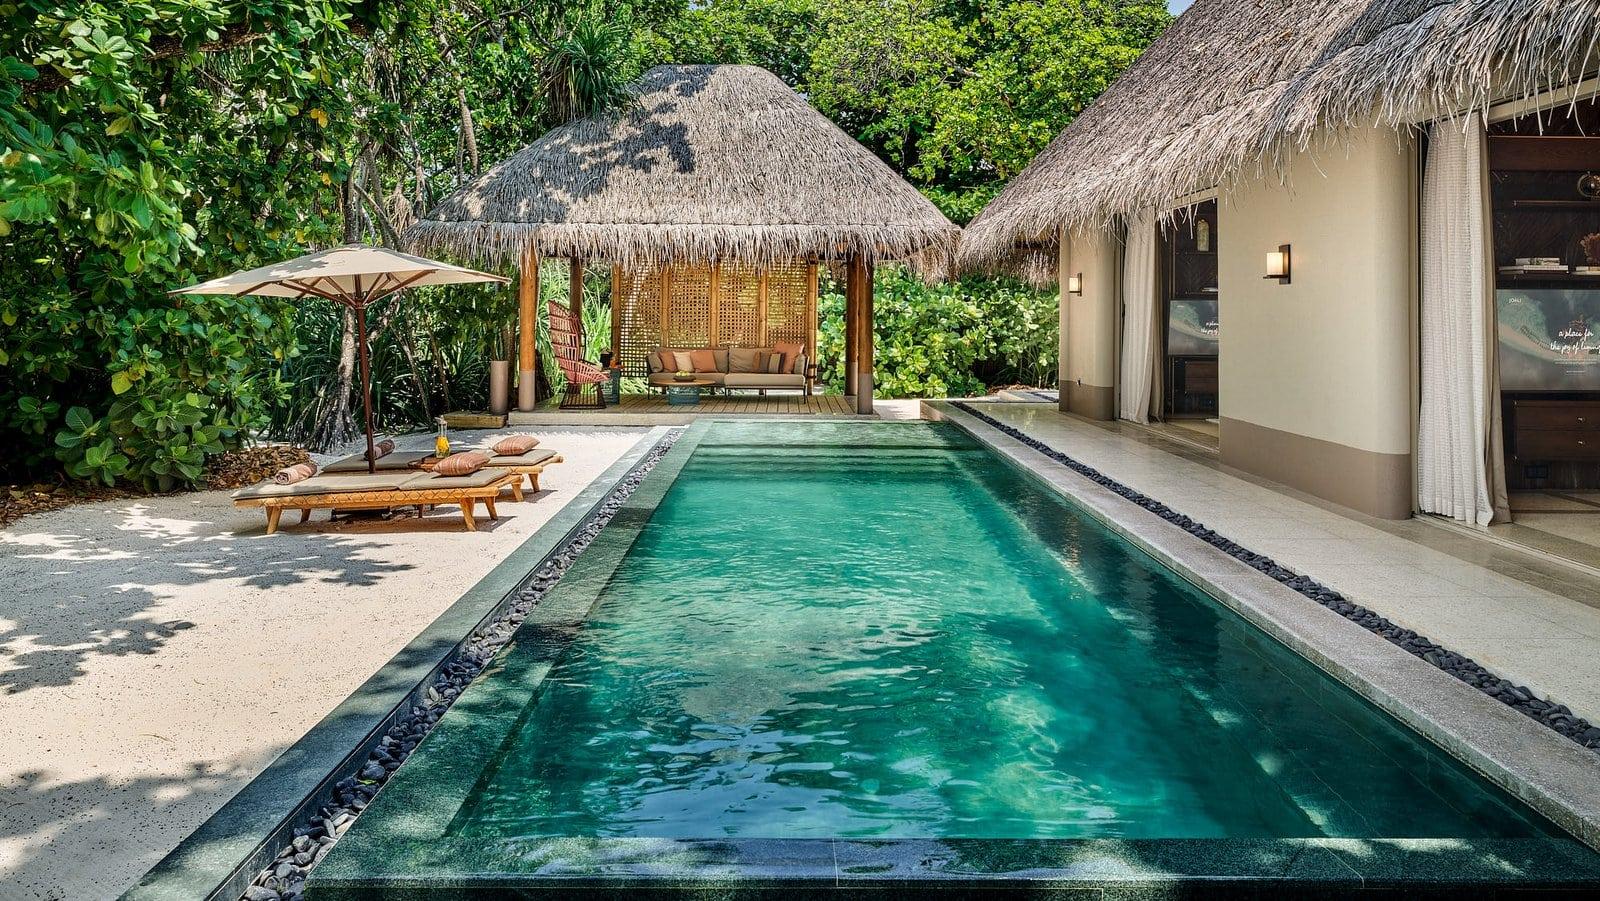 Мальдивы, отель Joali Maldives, номер Luxury Beach Villa with Pool